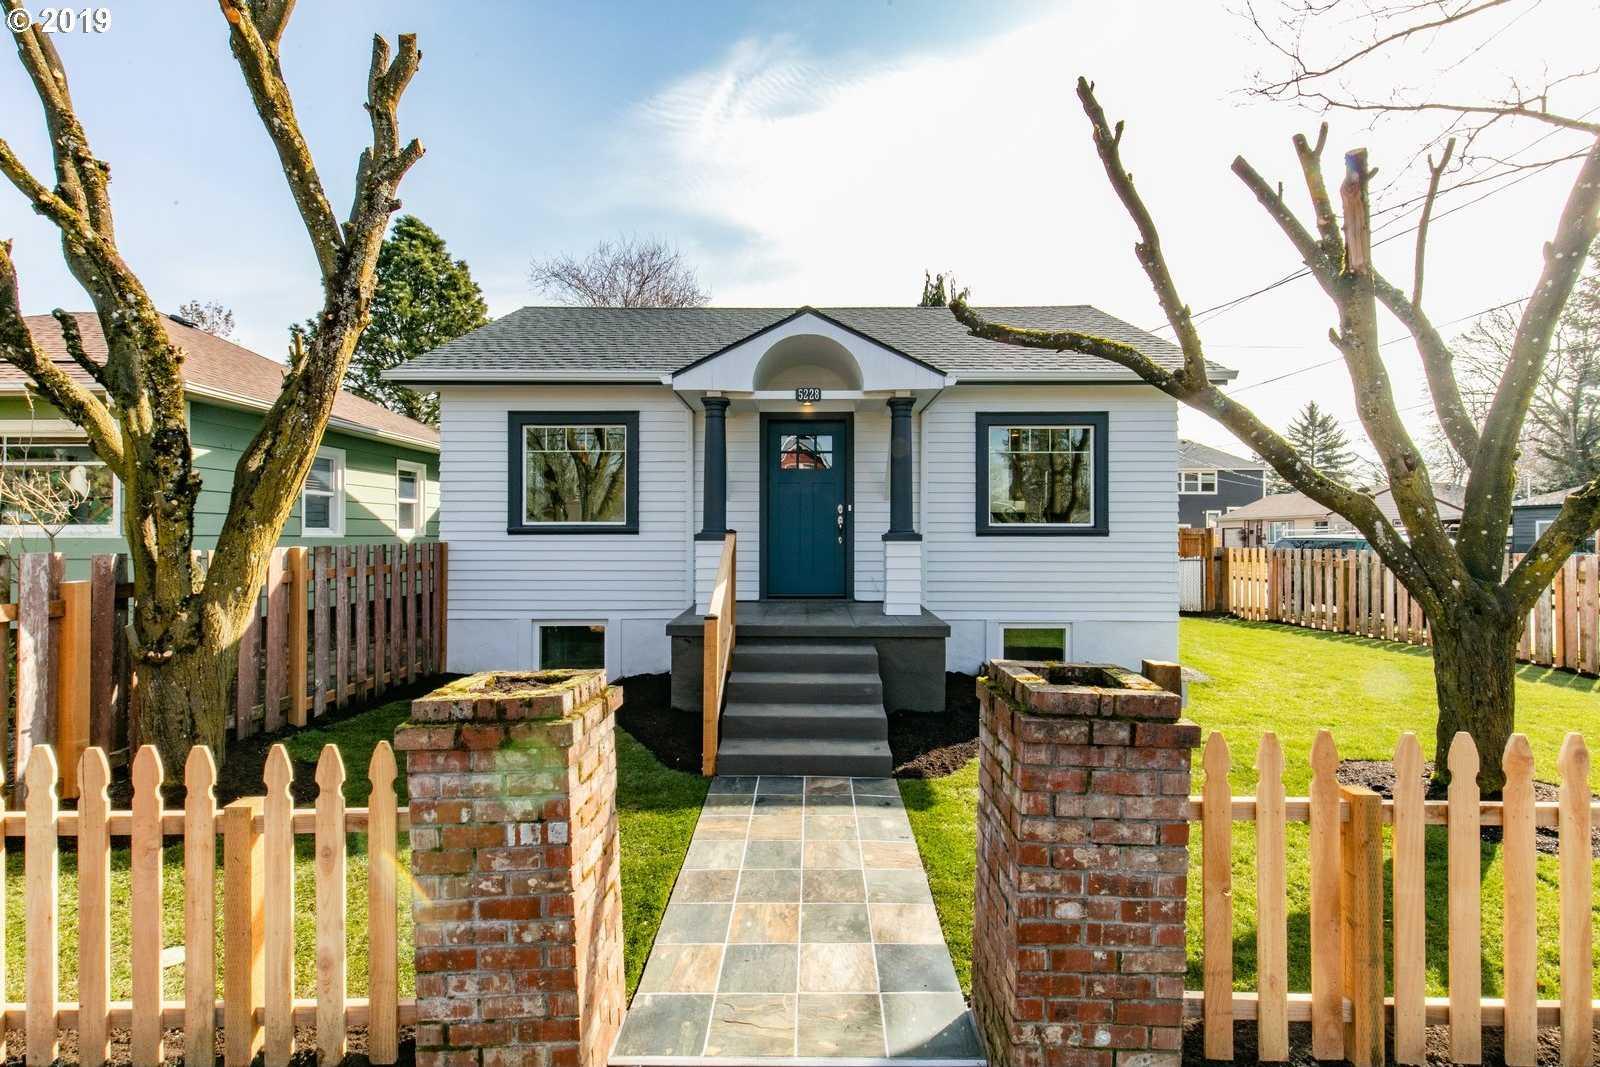 $549,900 - 6Br/4Ba -  for Sale in Mt Scott-arleta/fo-po, Portland